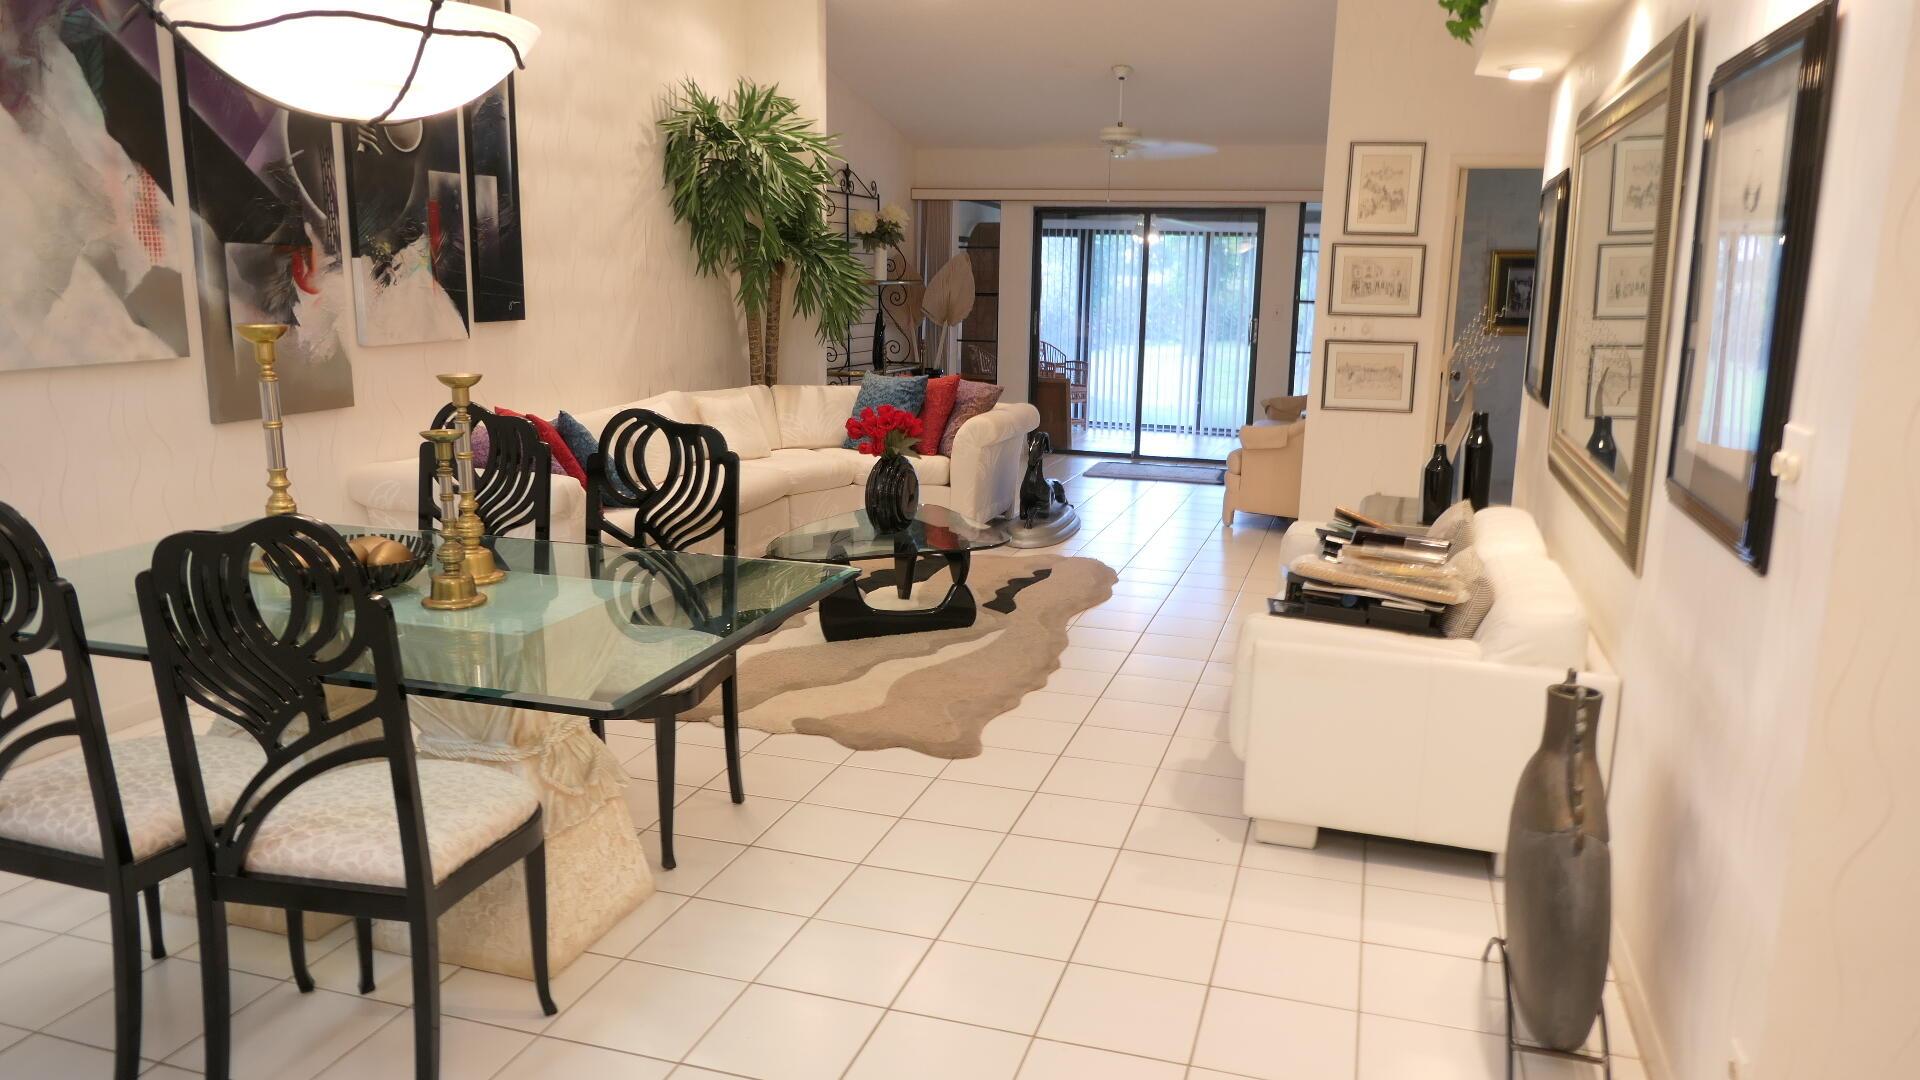 10977 Washingtonia Palm Court B Boynton Beach, FL 33437 photo 25